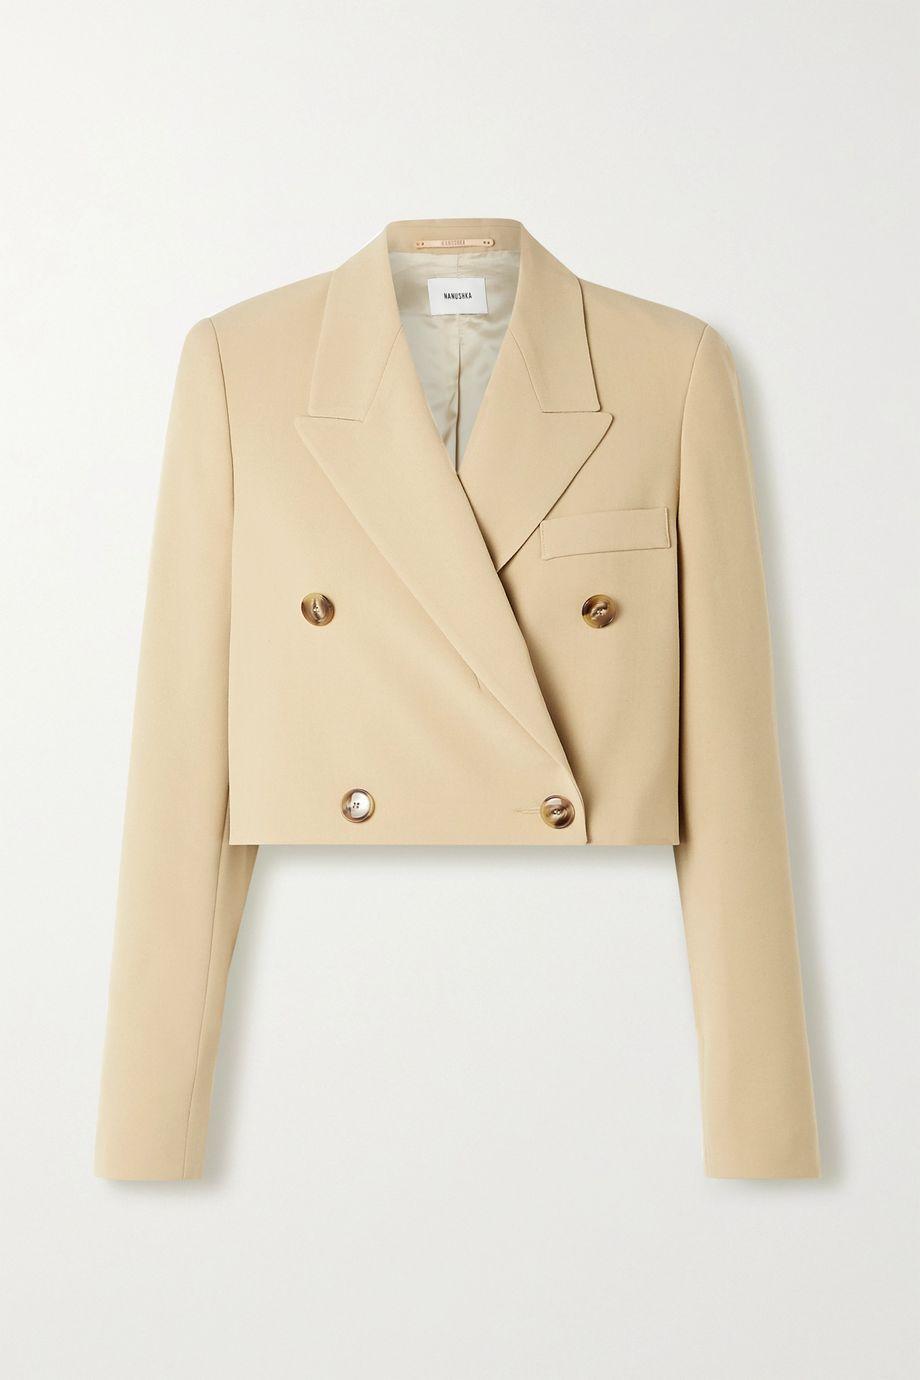 Nanushka Moscot cropped double-breasted woven blazer